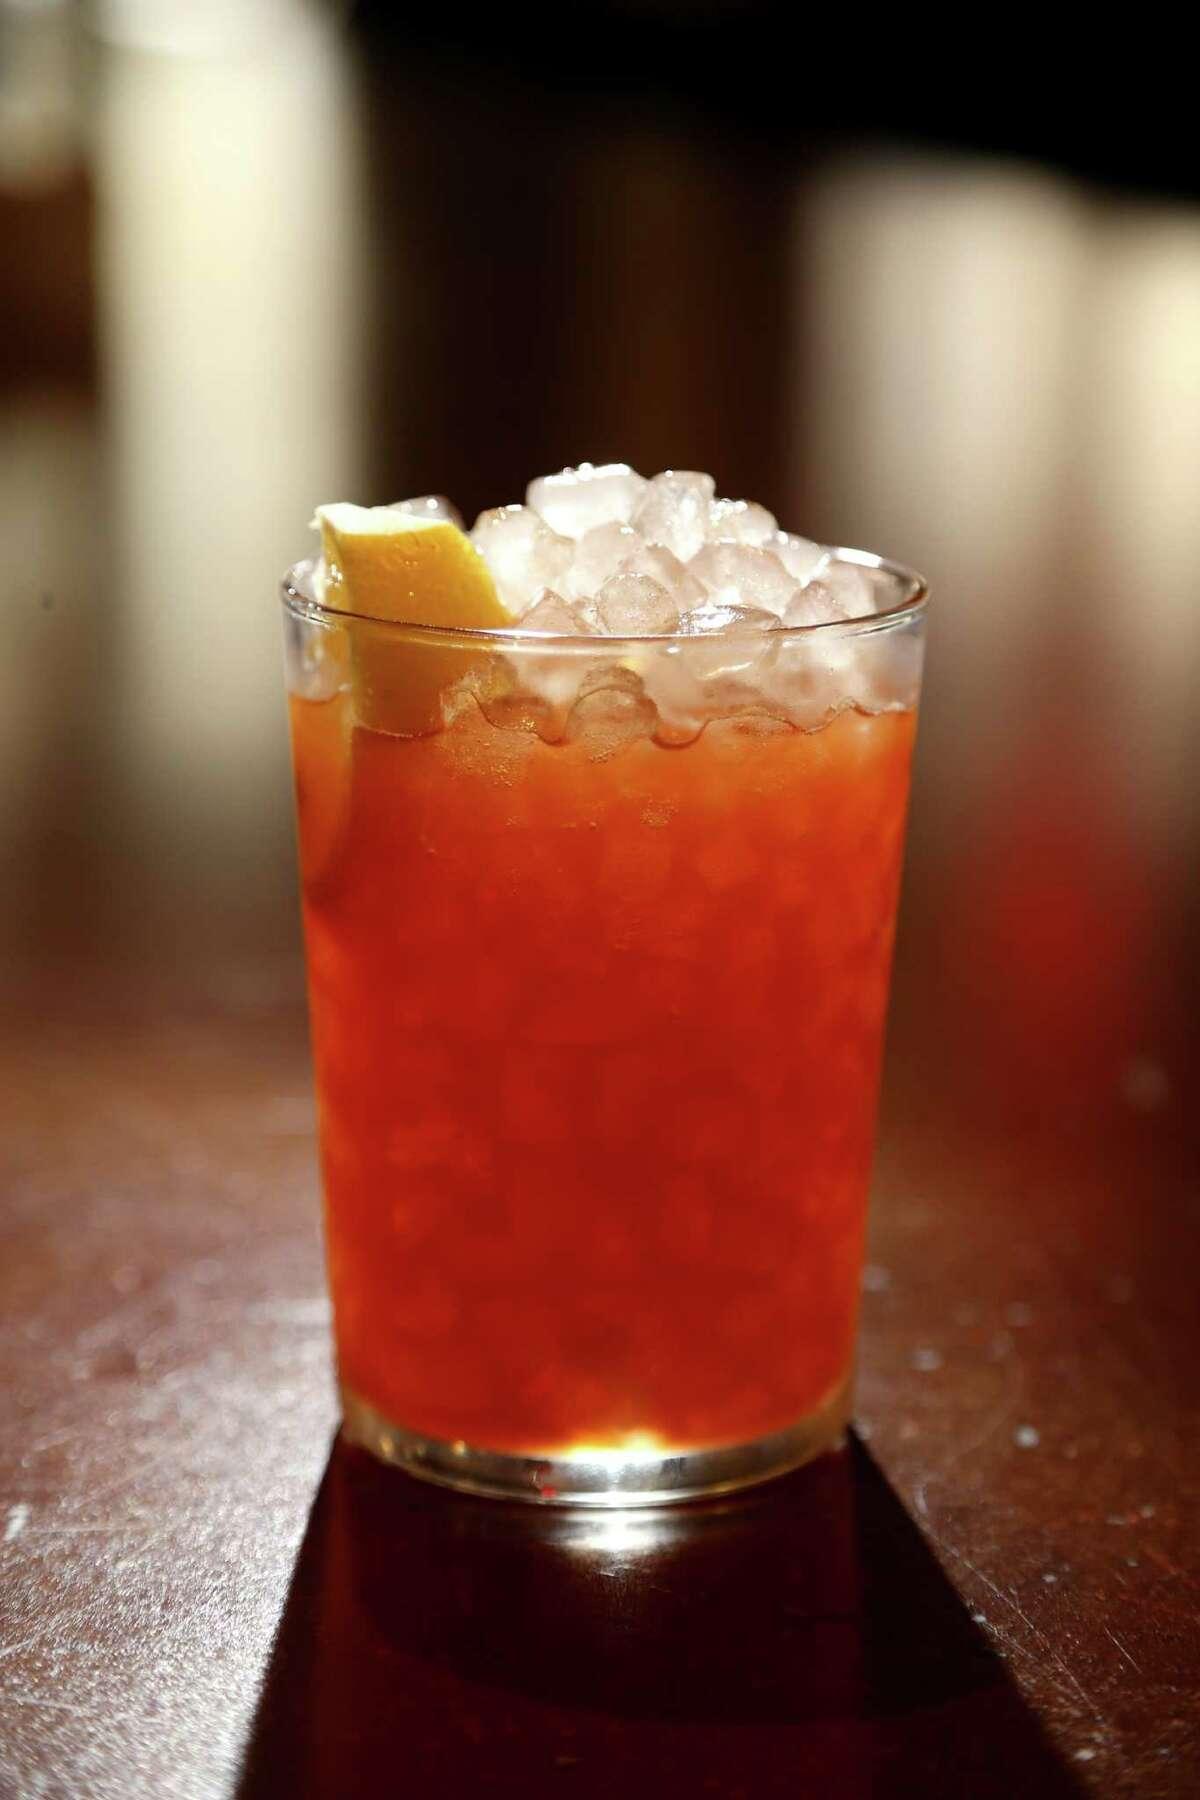 A Mid-Ocean Cooler; bourbon, rhubarb, Thai ginger, carrot and lemon served at Izakaya in Midtown Houston.